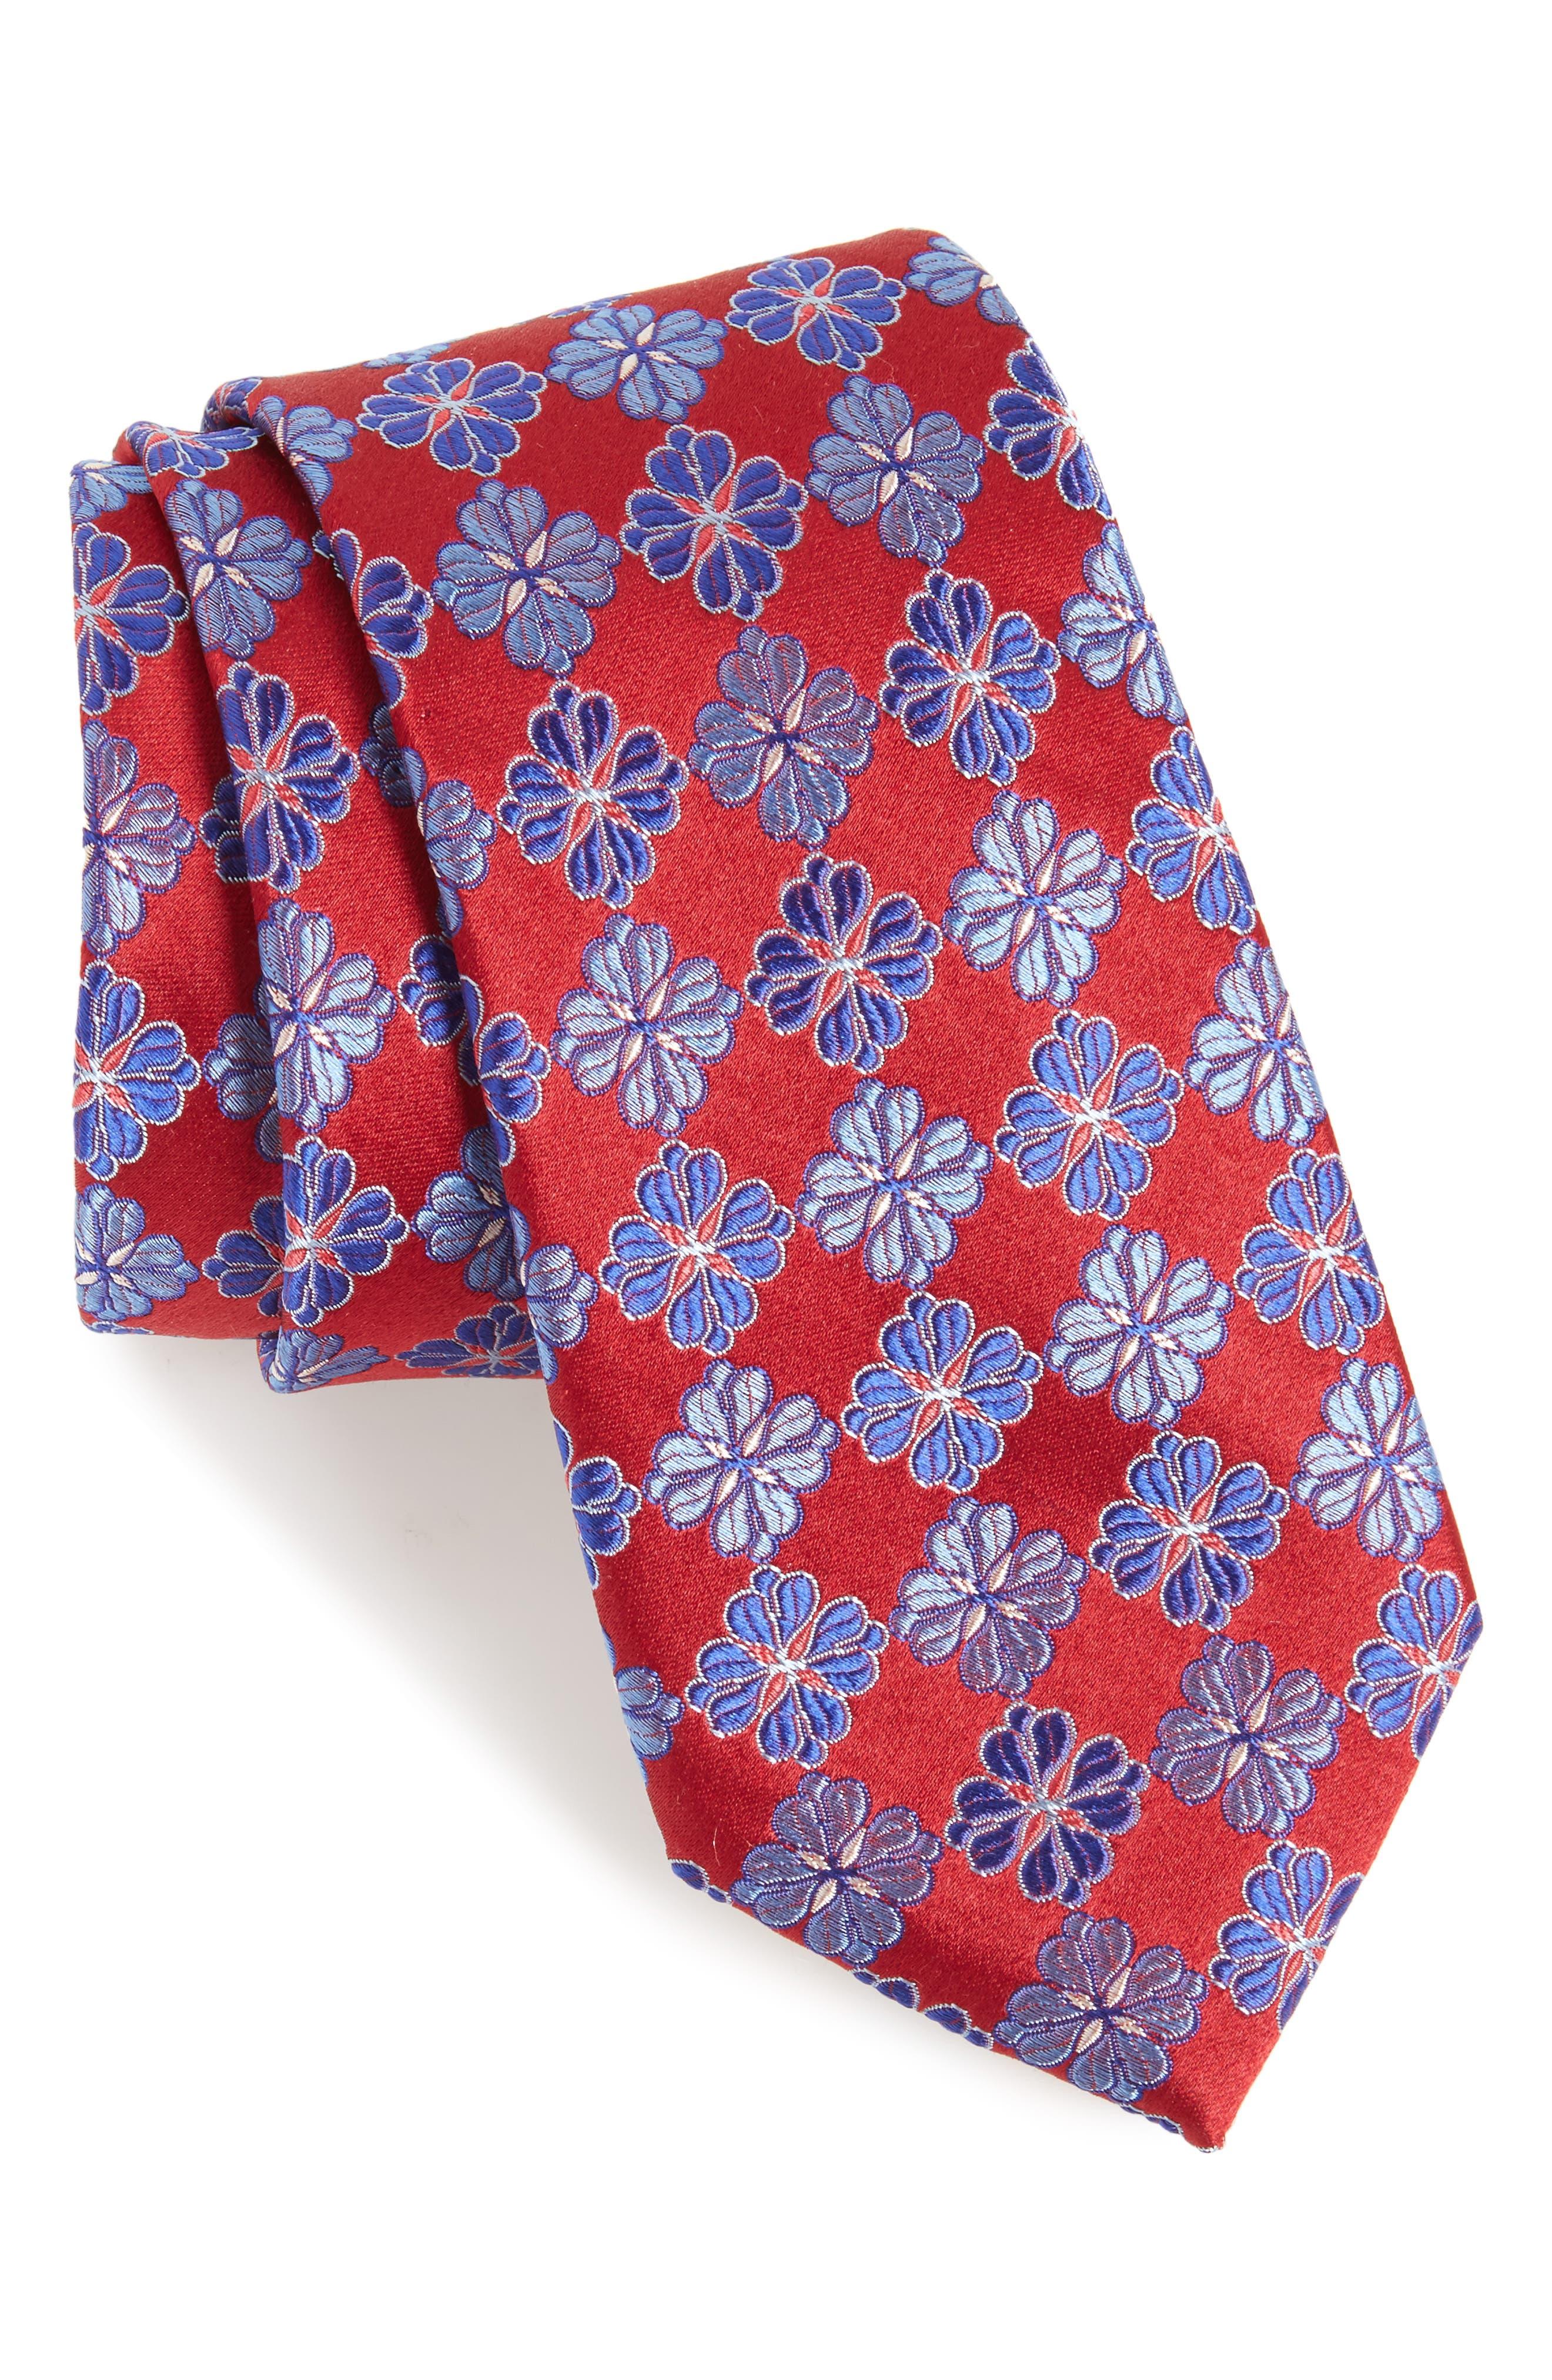 Nordstrom Men's Shop Cole Floral Silk Tie